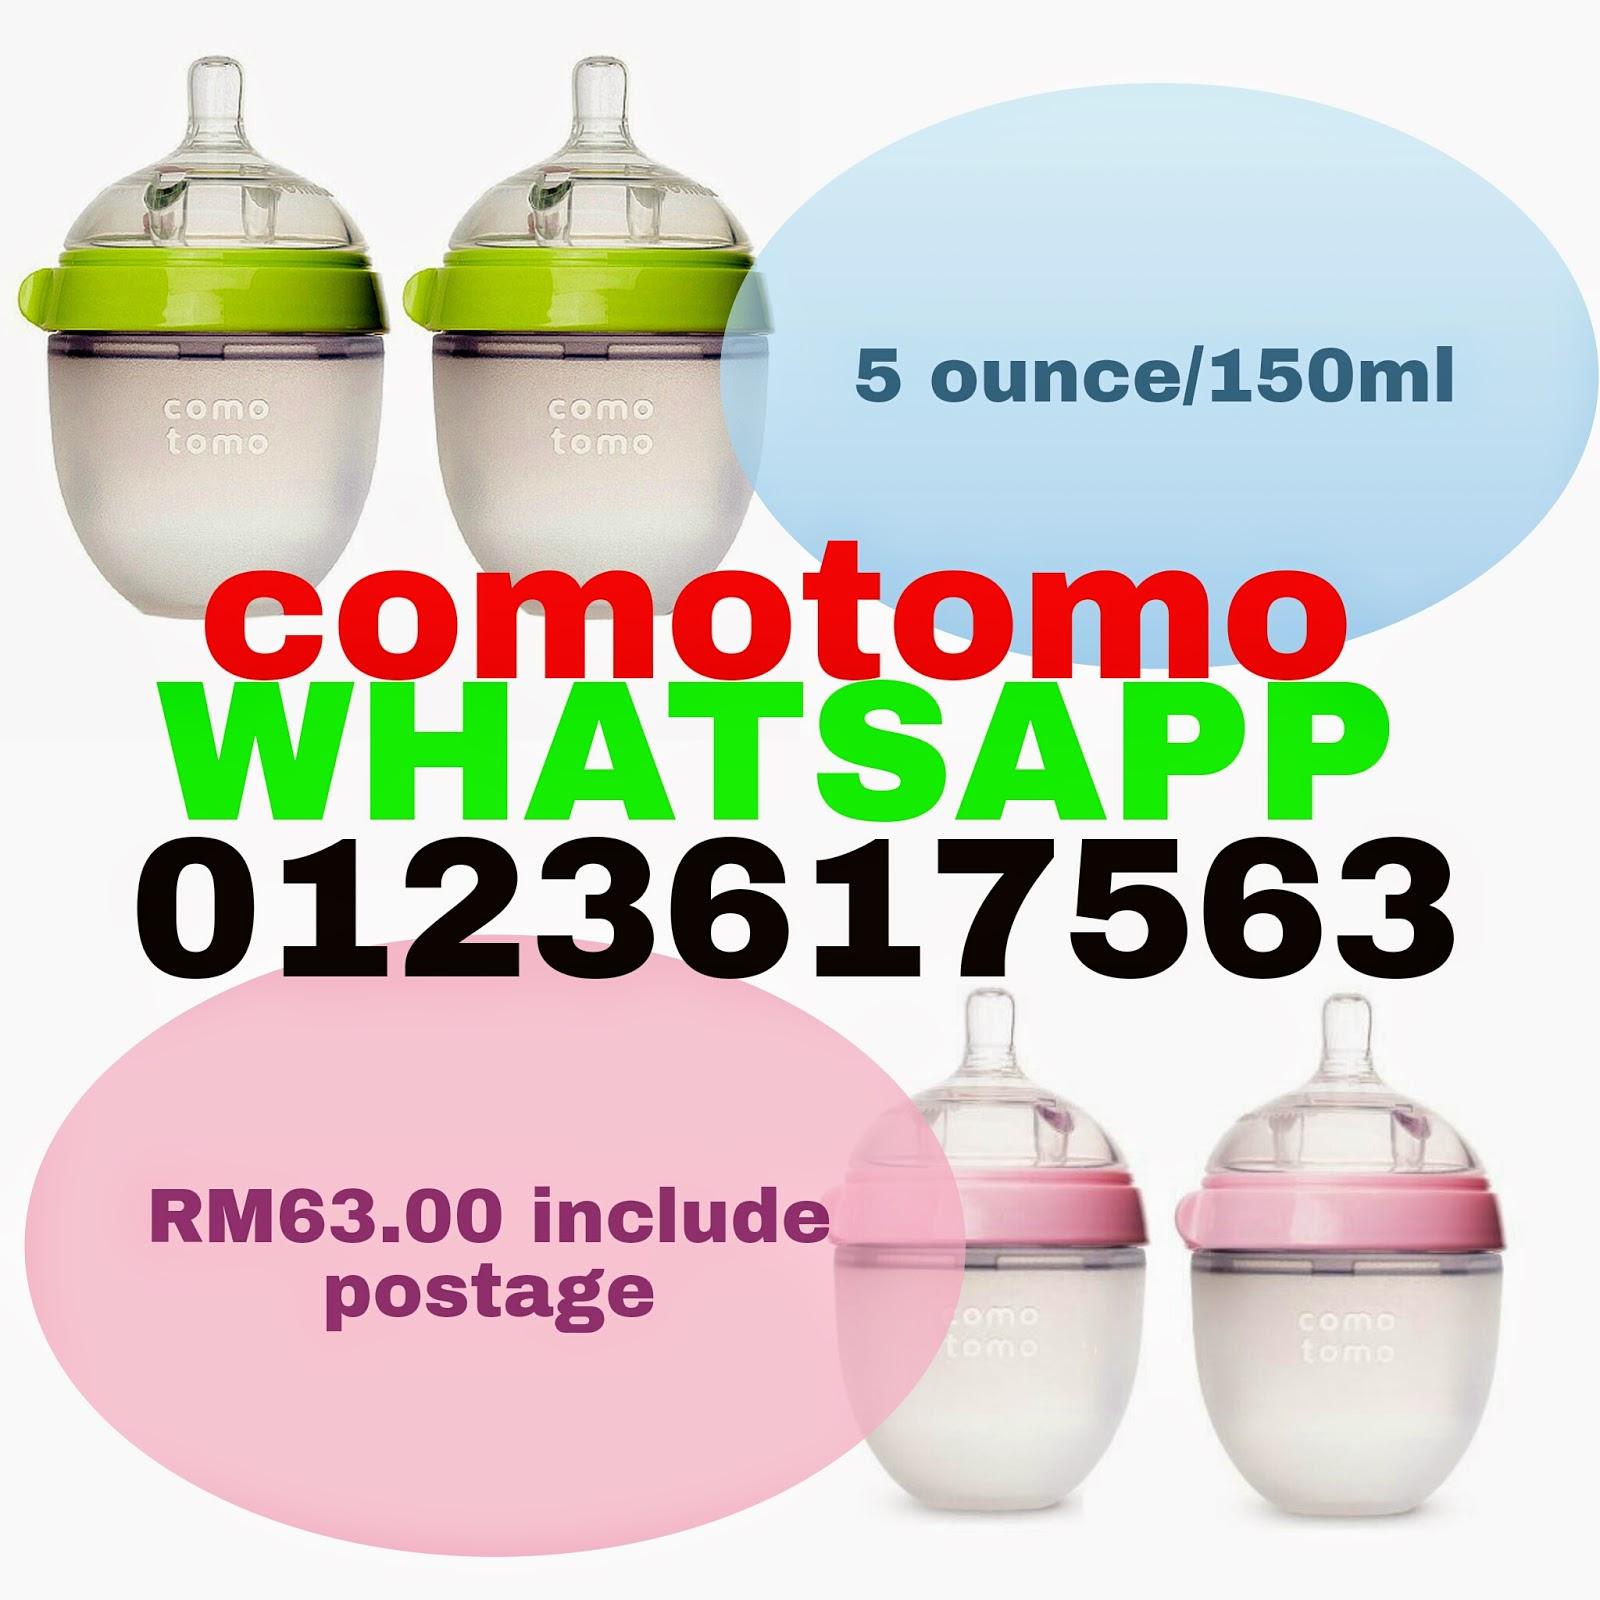 Botol Comotomo Malaysia 150 Ml Single Pack Pink Whatsapp 0123617563